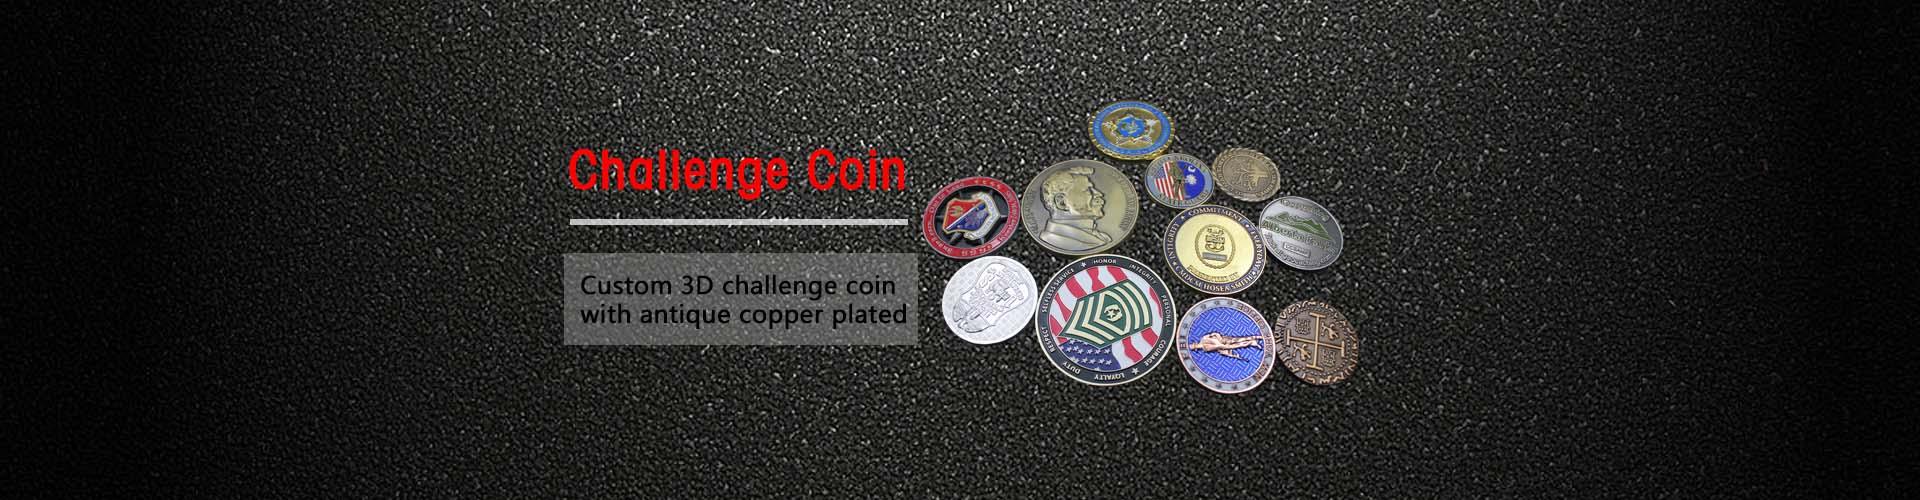 challenge coin,challenge coin manufacturer,custom challenge coin